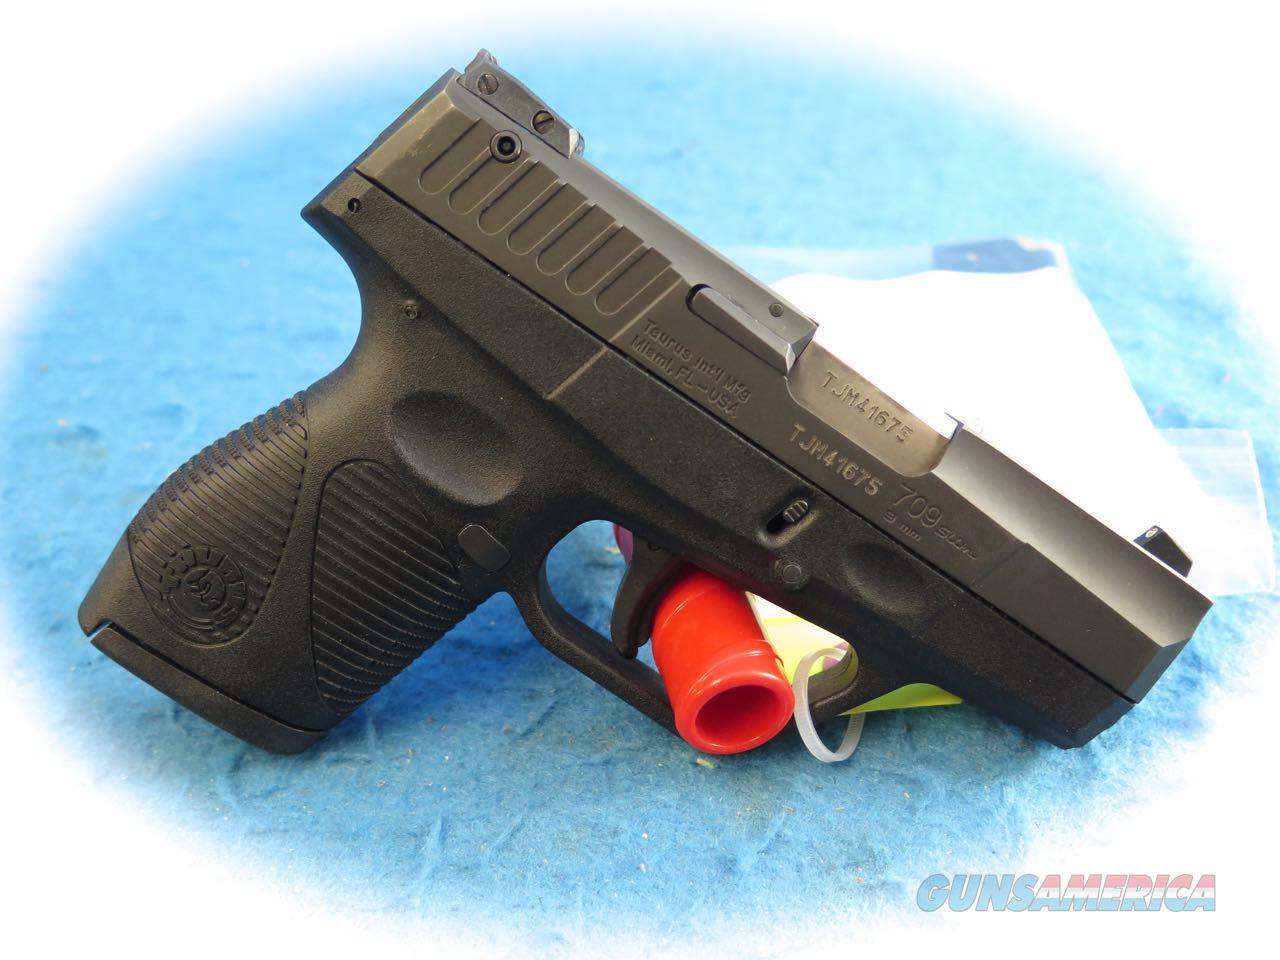 709 slim 9mm pistol - Taurus Model 709 Slim 9mm Semi Auto Pistol Used Guns Pistols